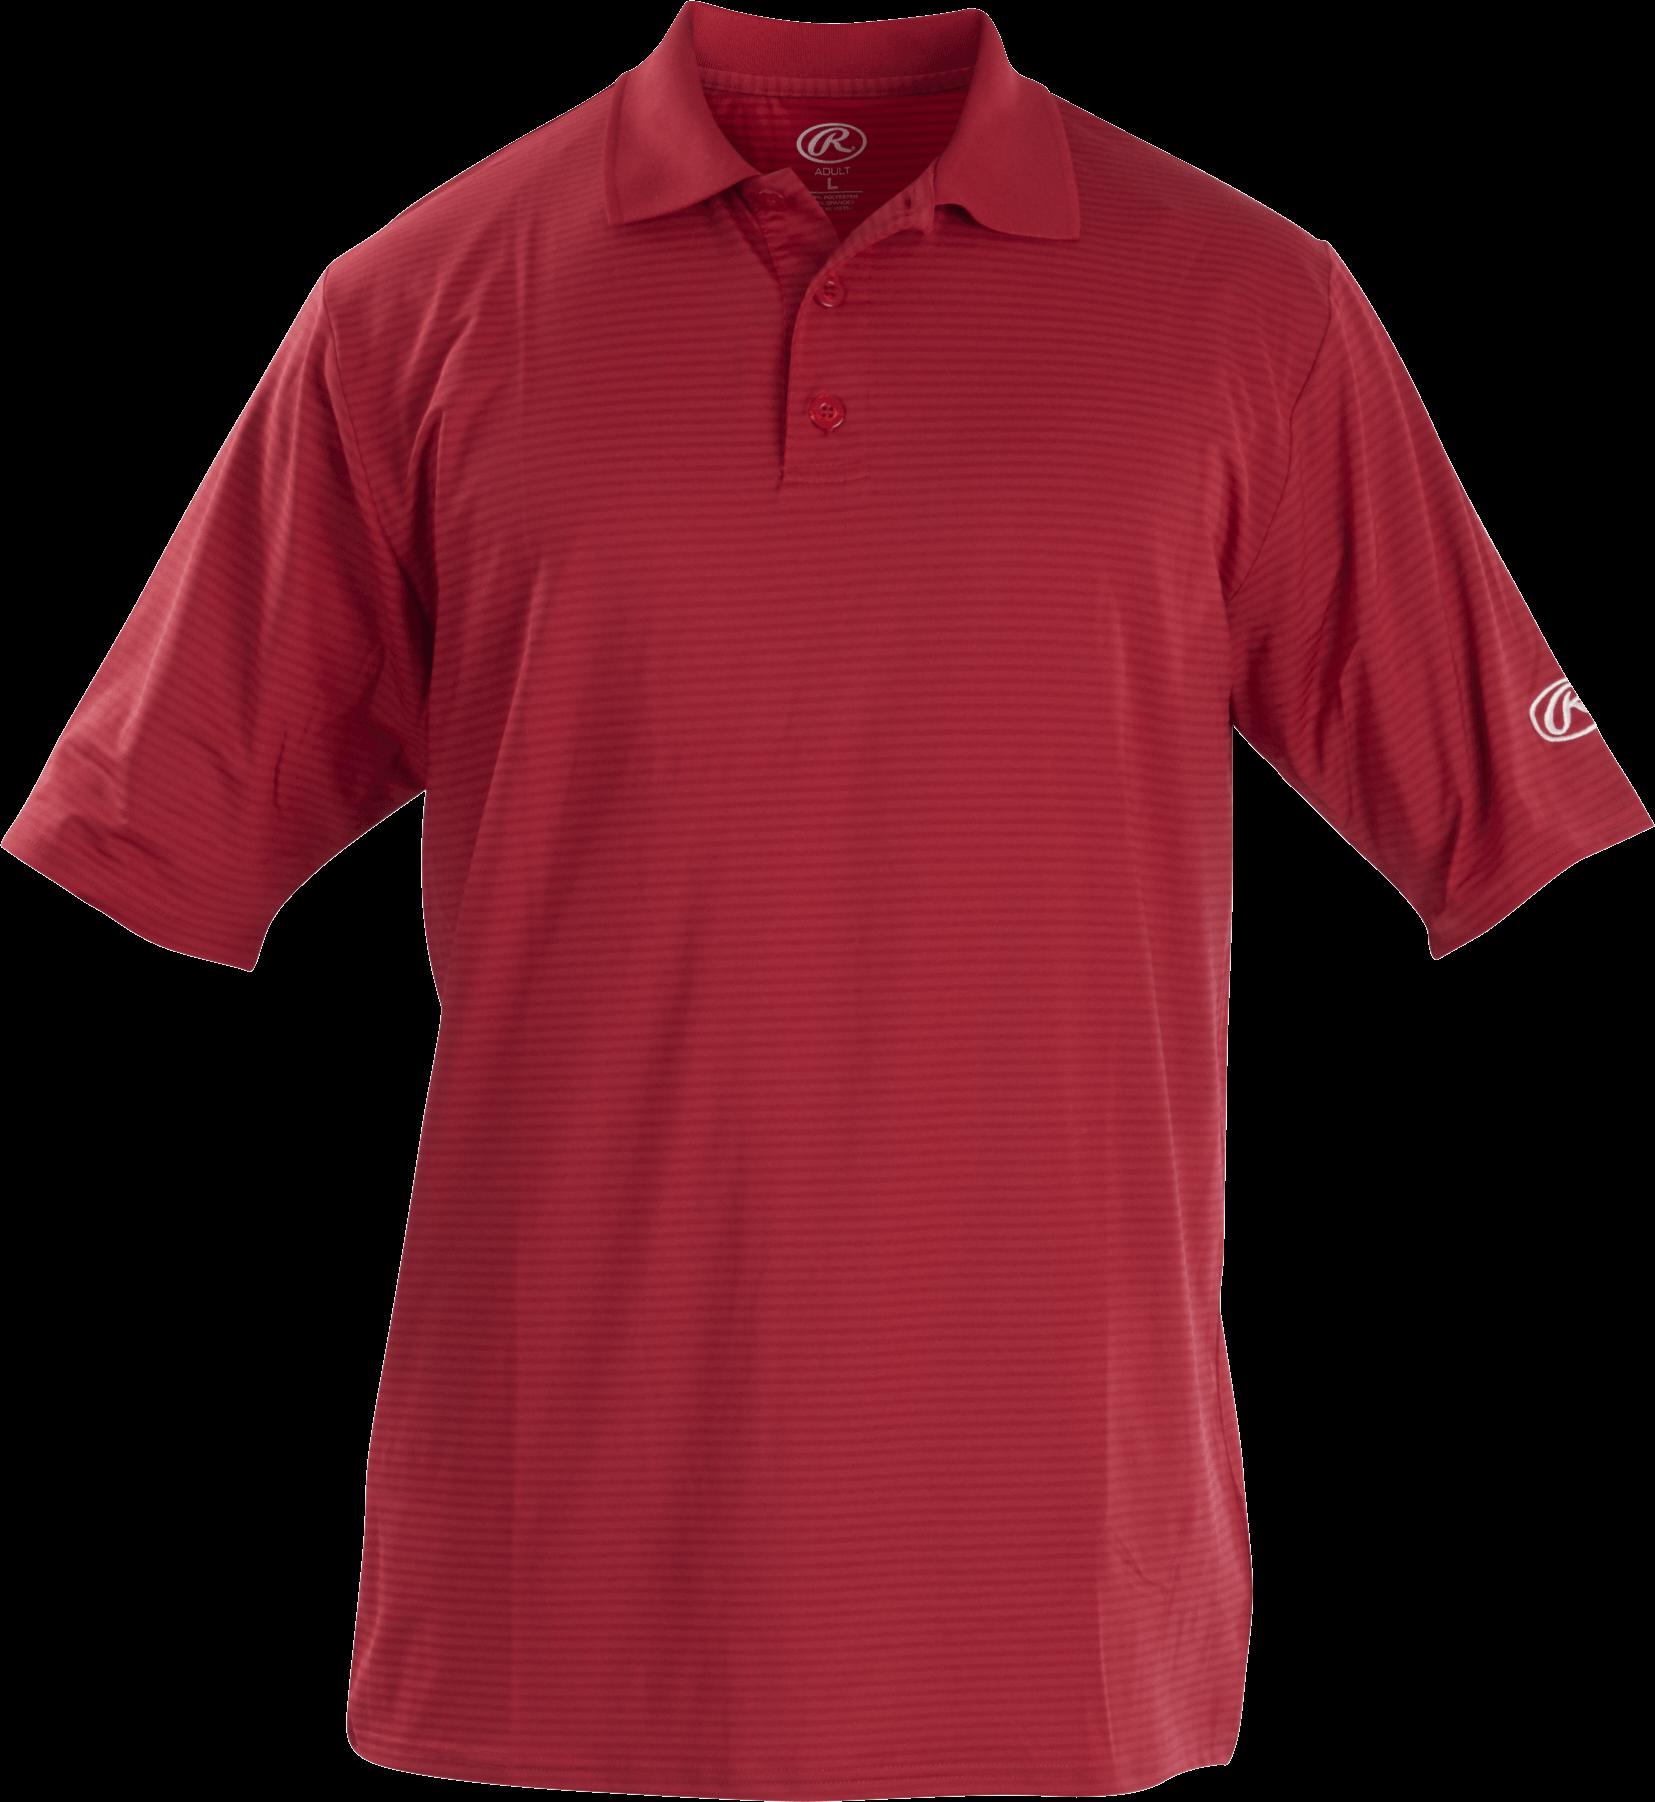 Rawlings Adult Short Sleeve Polo Shirt, 2-Button Front, Sport Baseball | Softball | Football |